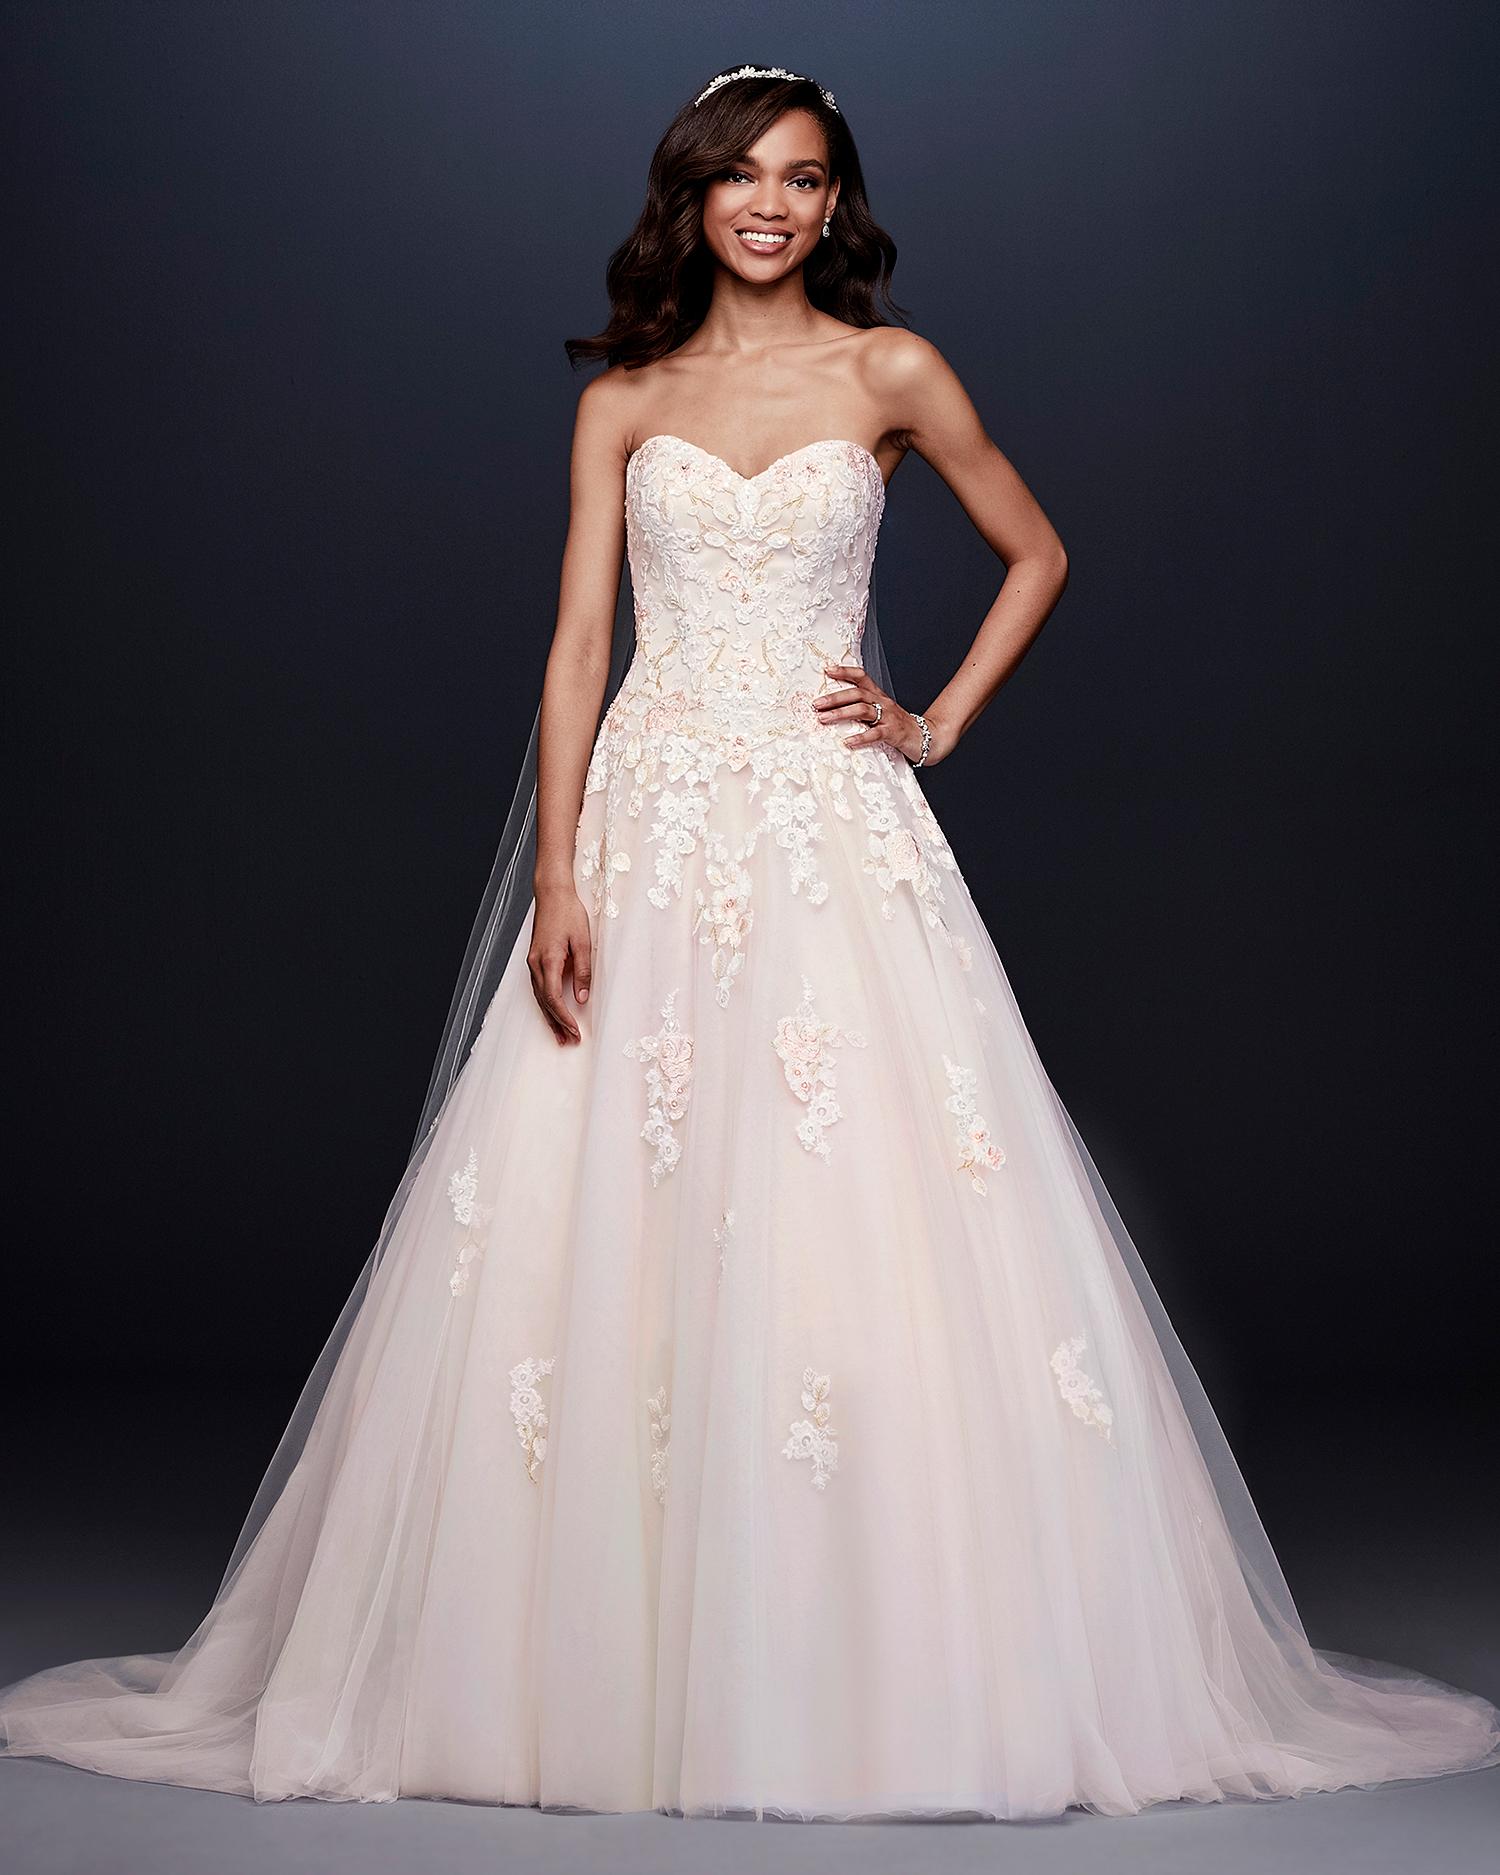 davids bridal wedding dress fall 2019 blush sweetheart with appliques